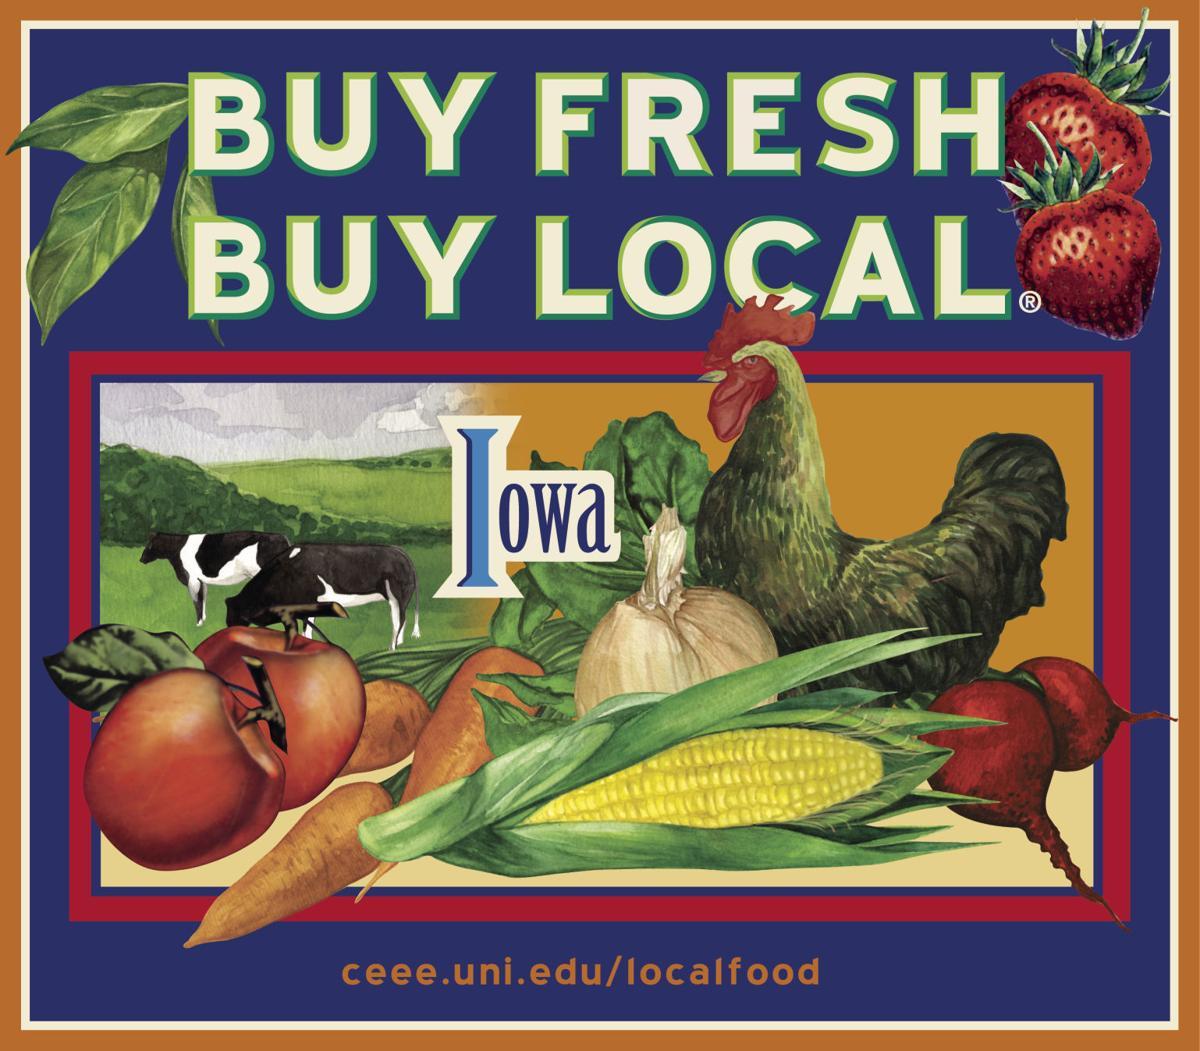 2019 buy fresh buy local logo.jpg